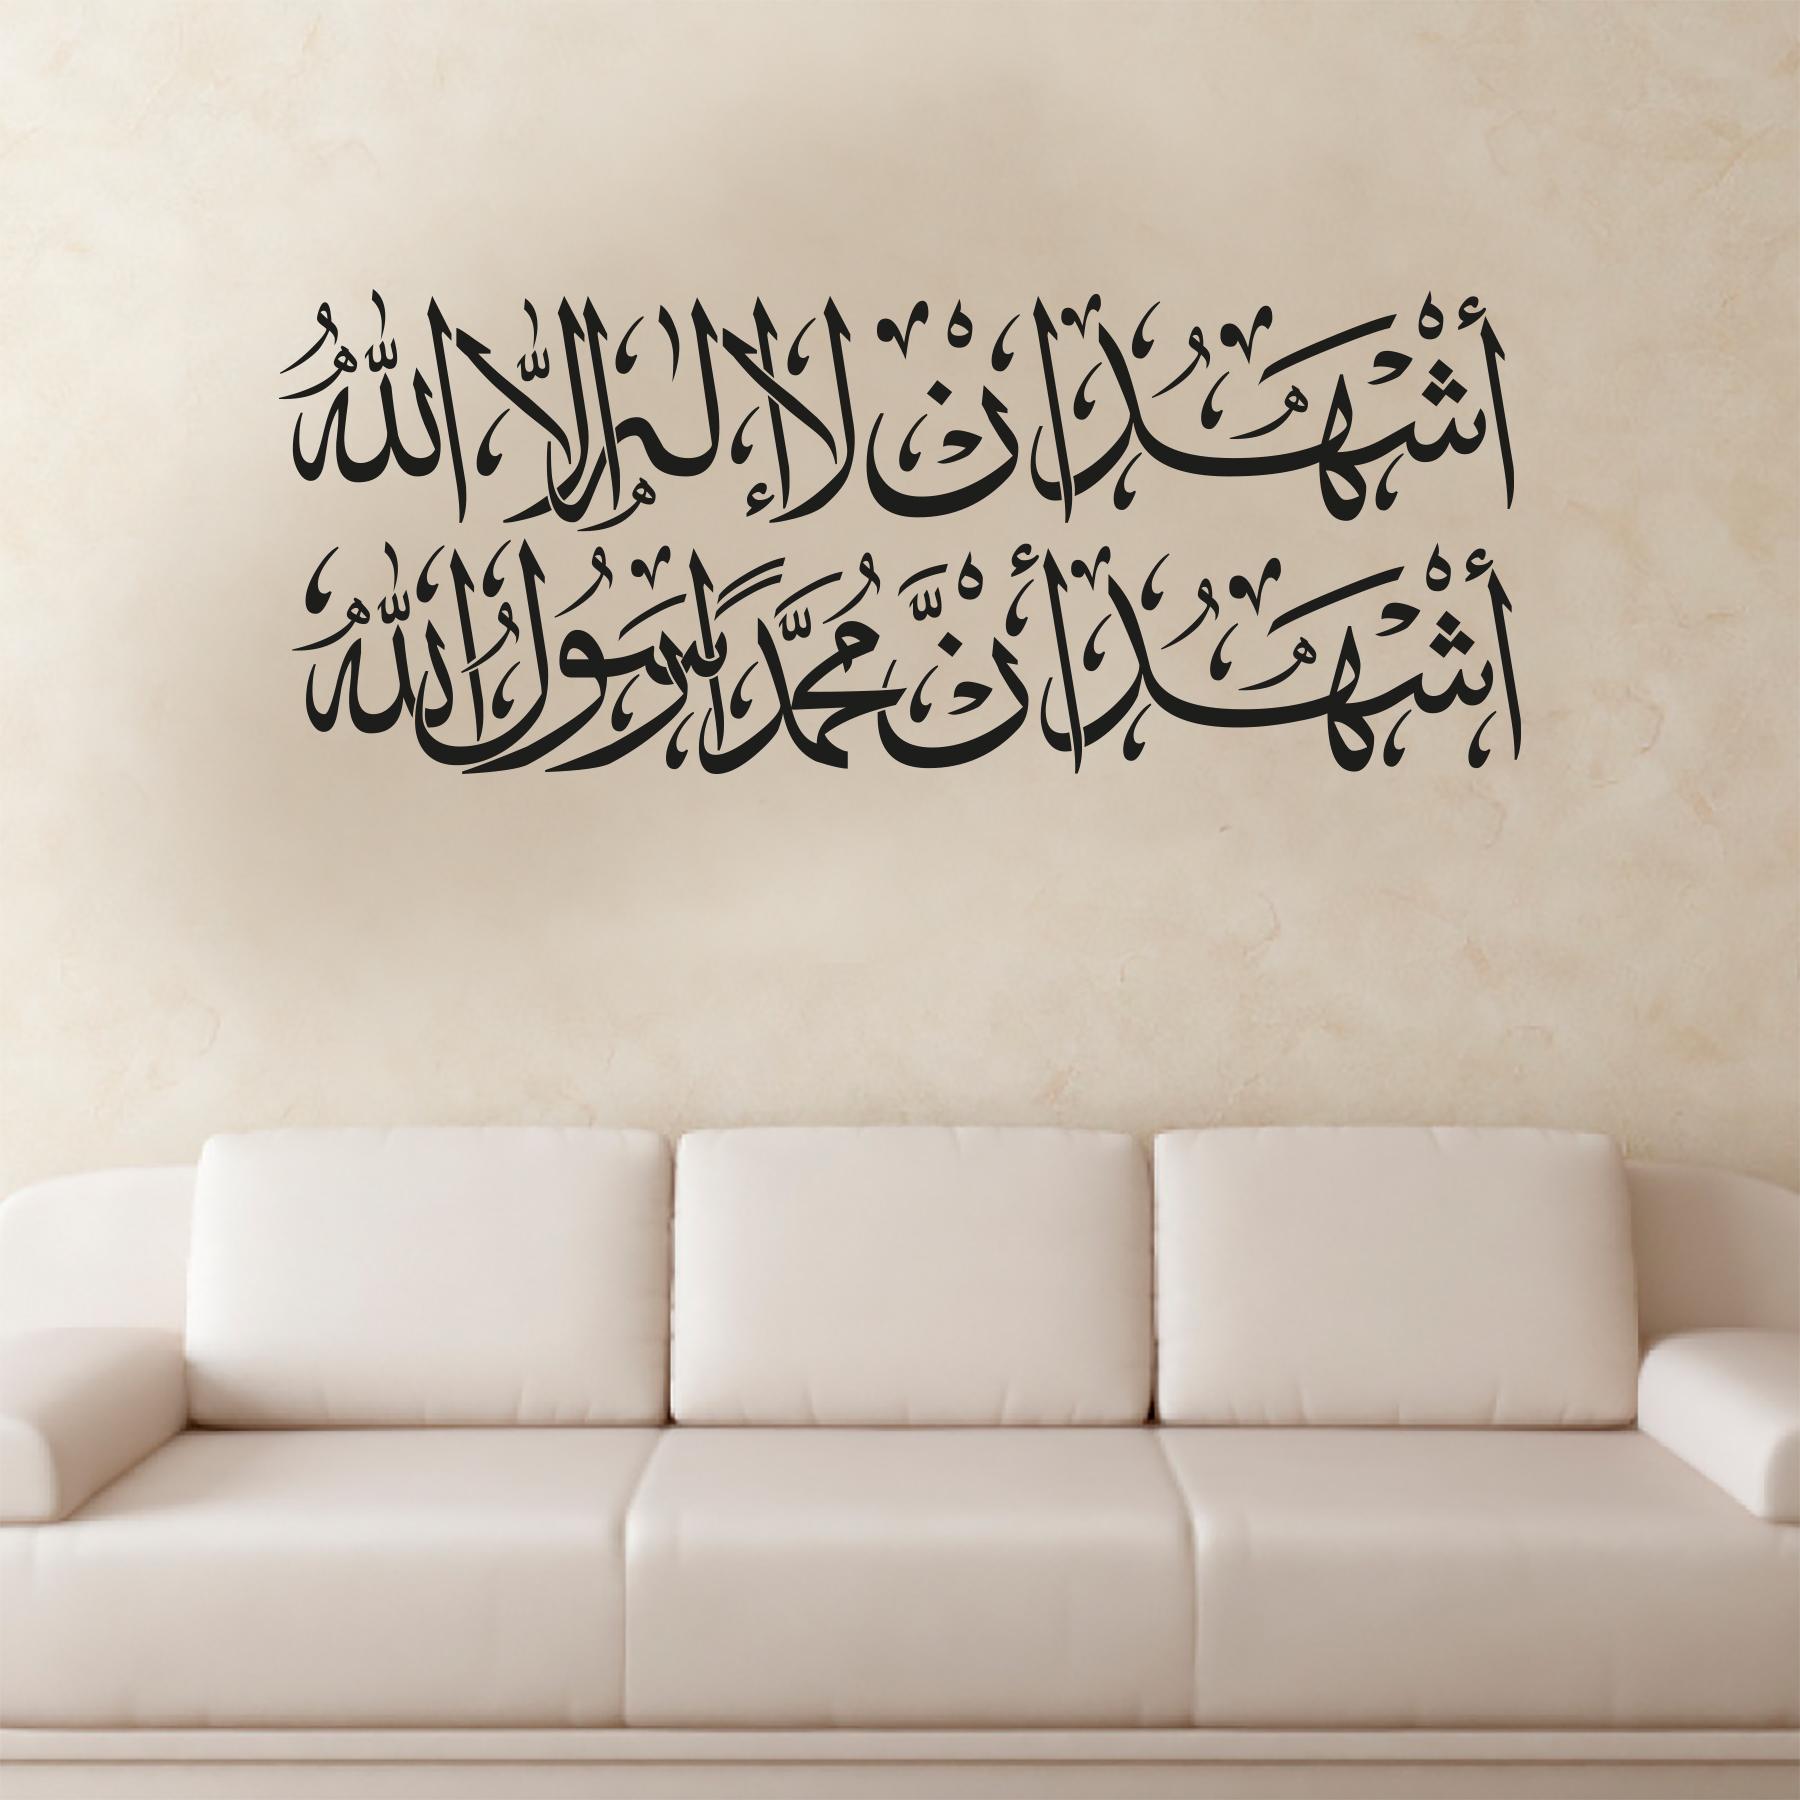 bismillahirrahmanirrahim islamische wandtattoo islam aufkleber muslim besemeleh ebay. Black Bedroom Furniture Sets. Home Design Ideas